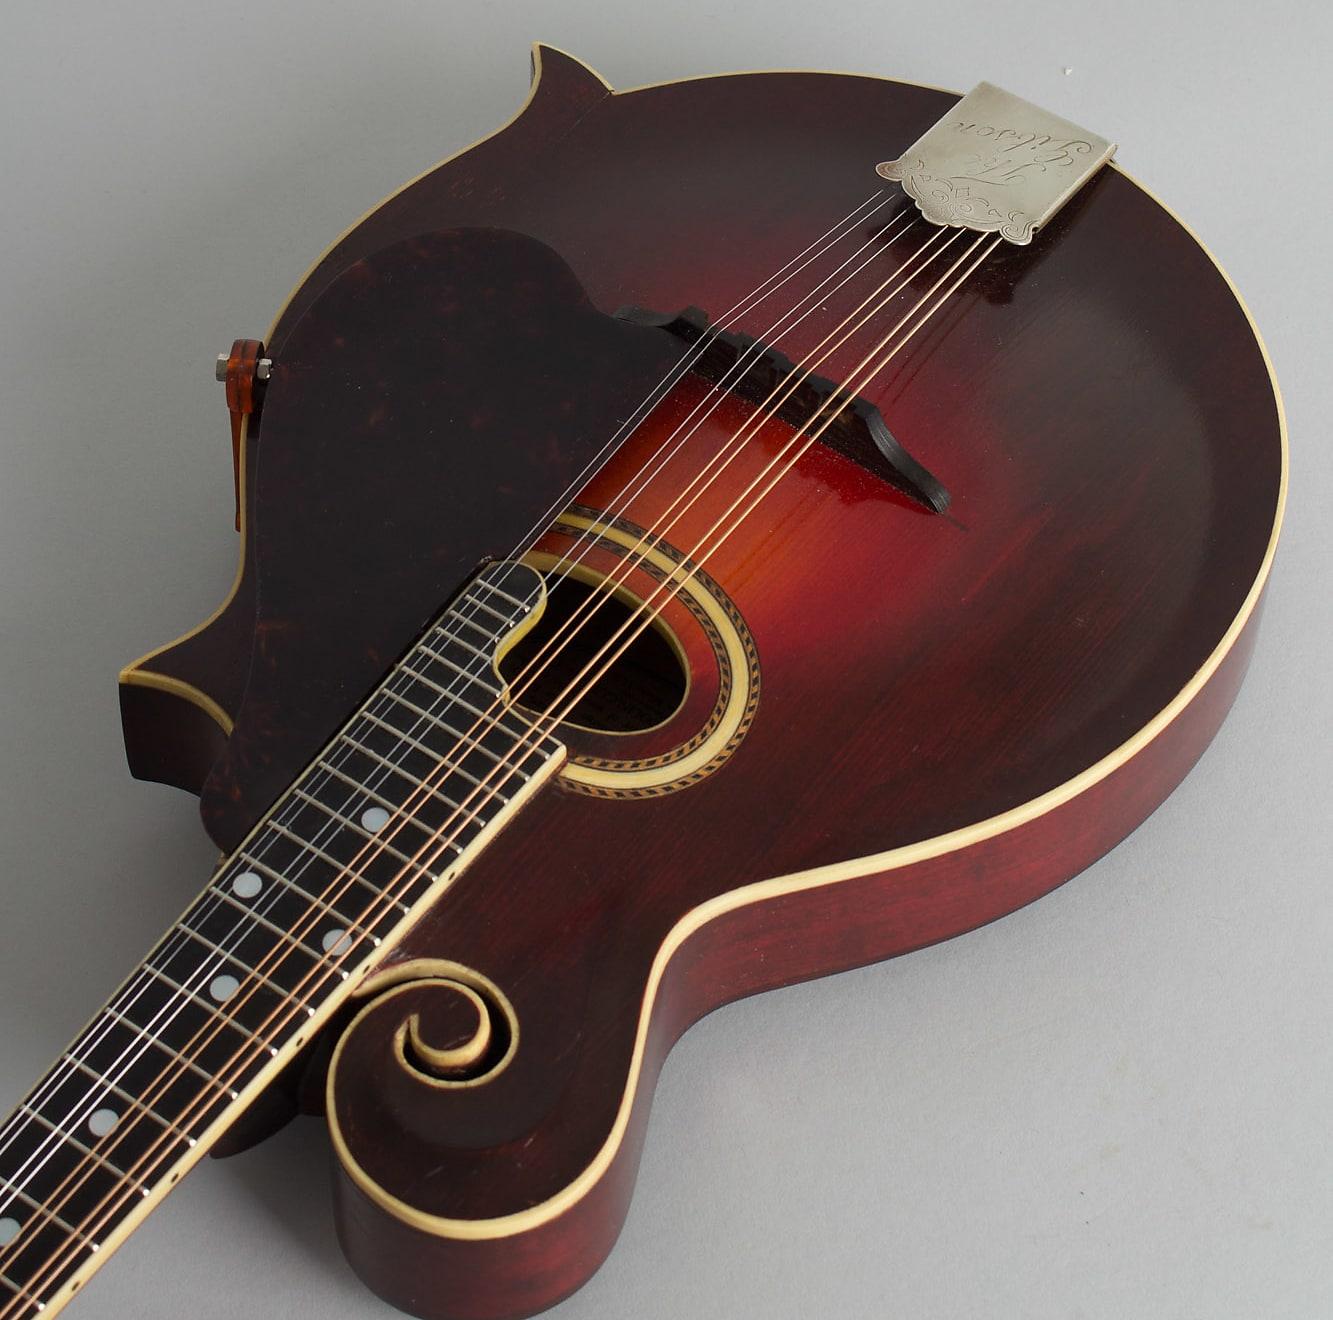 Gibson  F-2 Carved Top Mandolin (1920), ser. #61196, black tolex hard shell case.